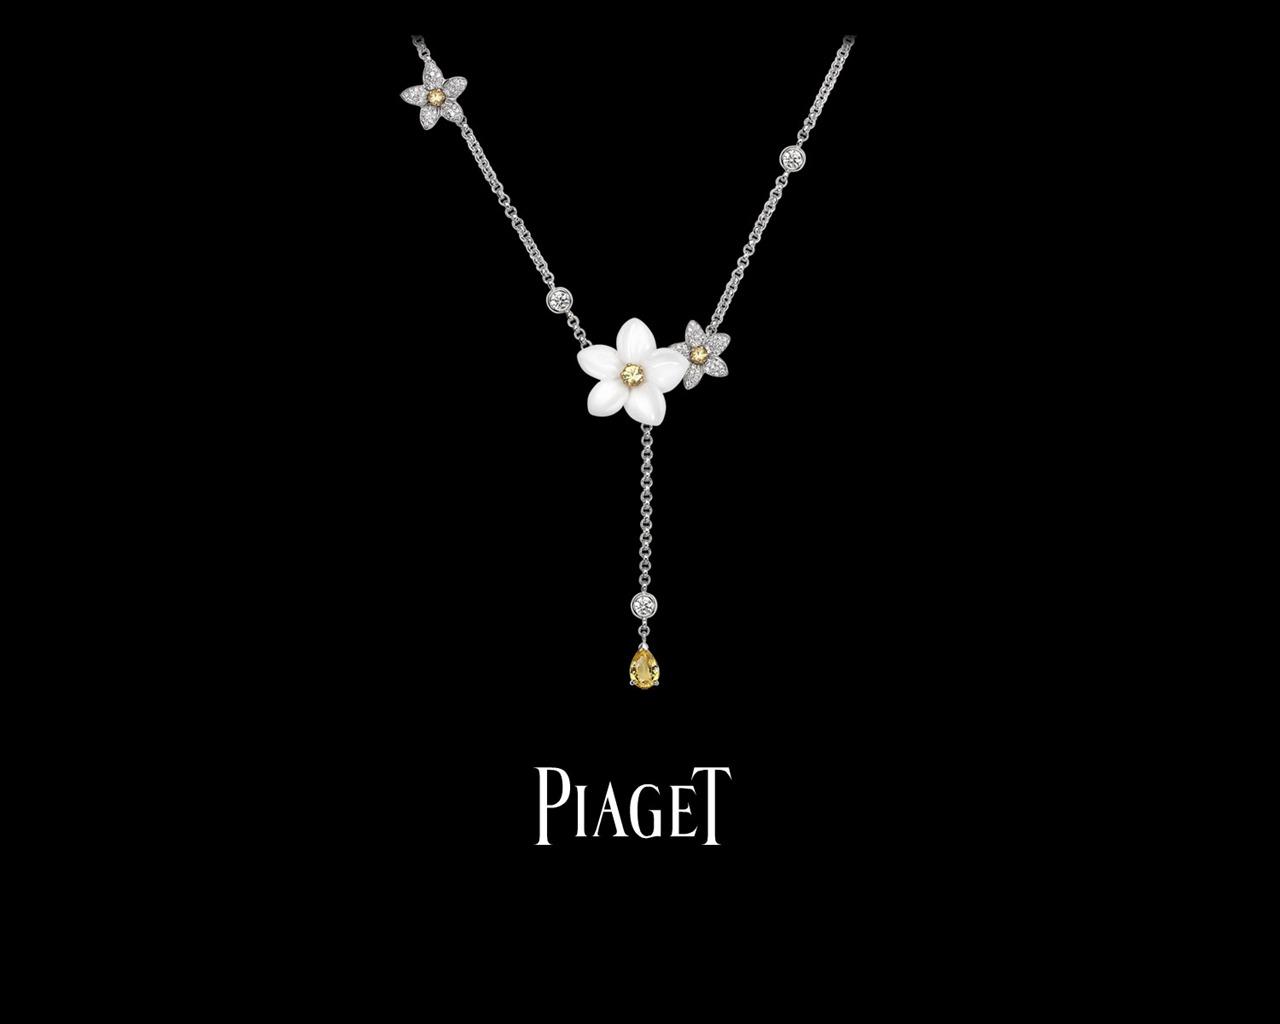 Piaget diamond jewelry wallpaper (4) #11 - 1280x1024 Wallpaper ...